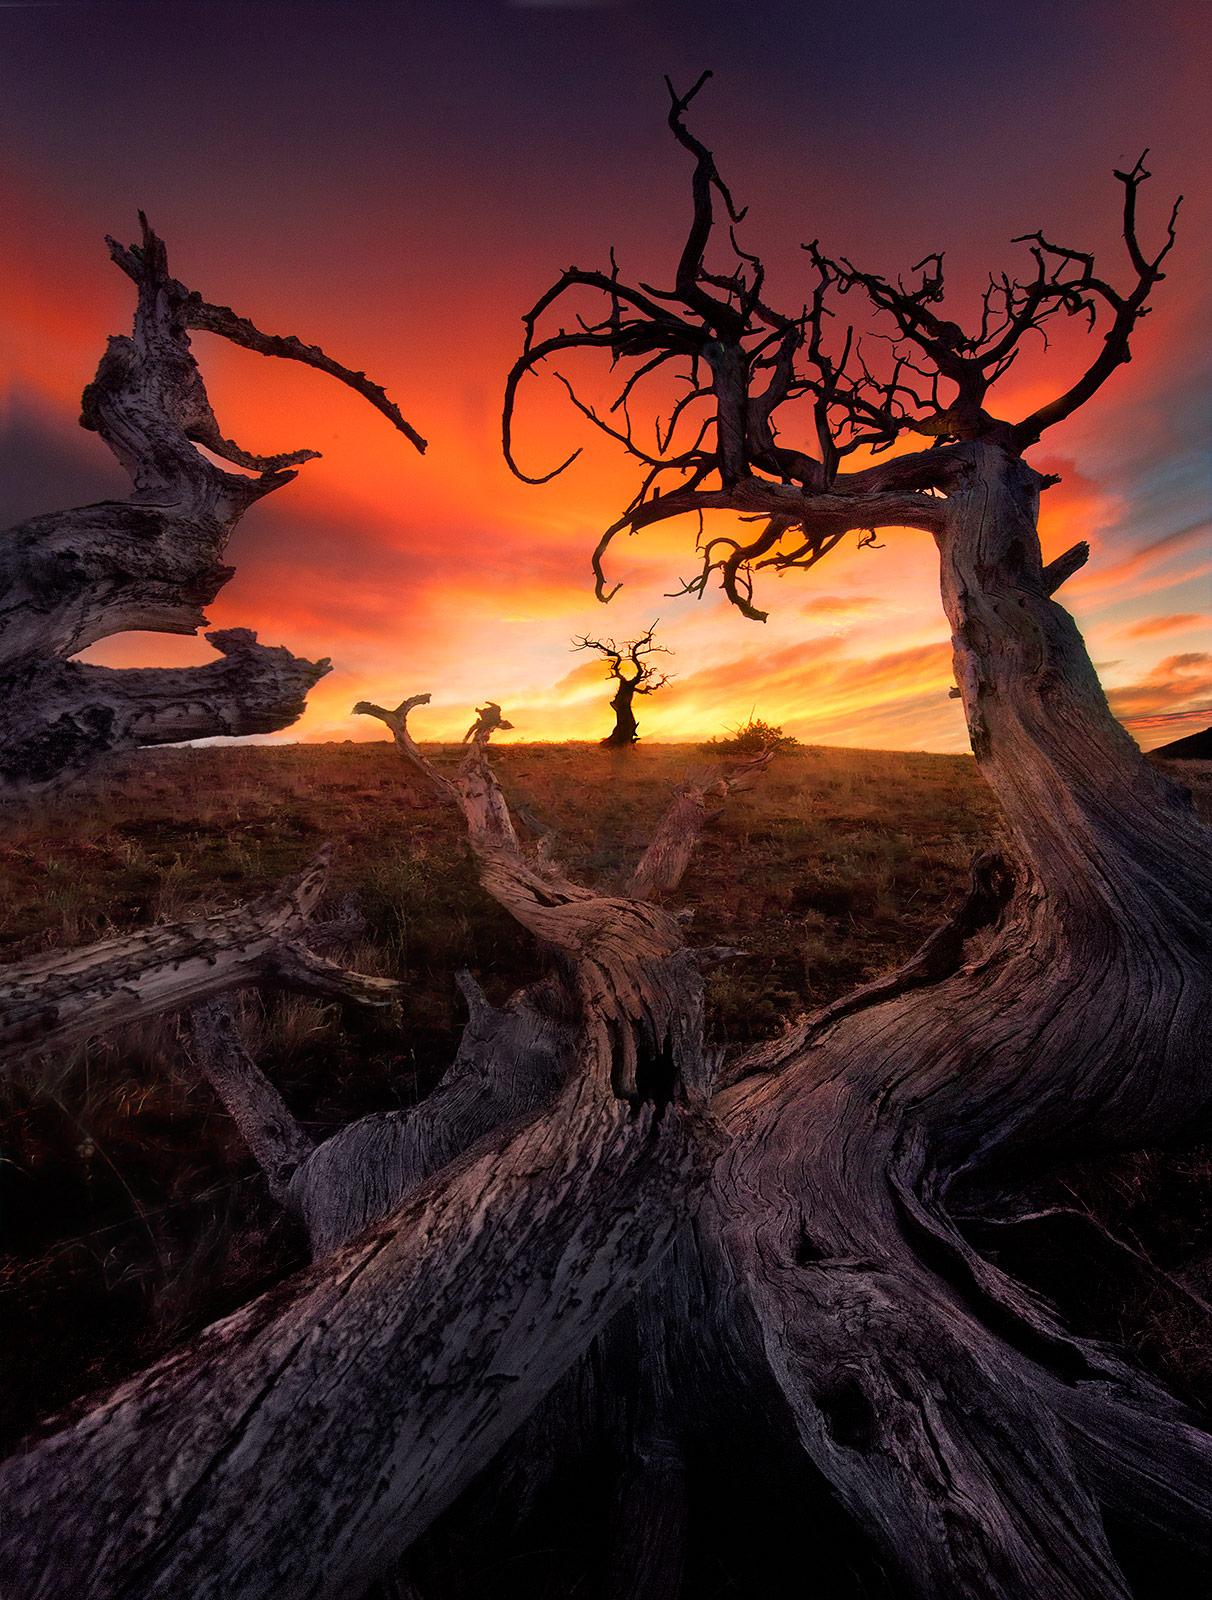 Whitebark, Pine, Montana, Plateau, Gnarled, Old, Sunrise, Rich, photo